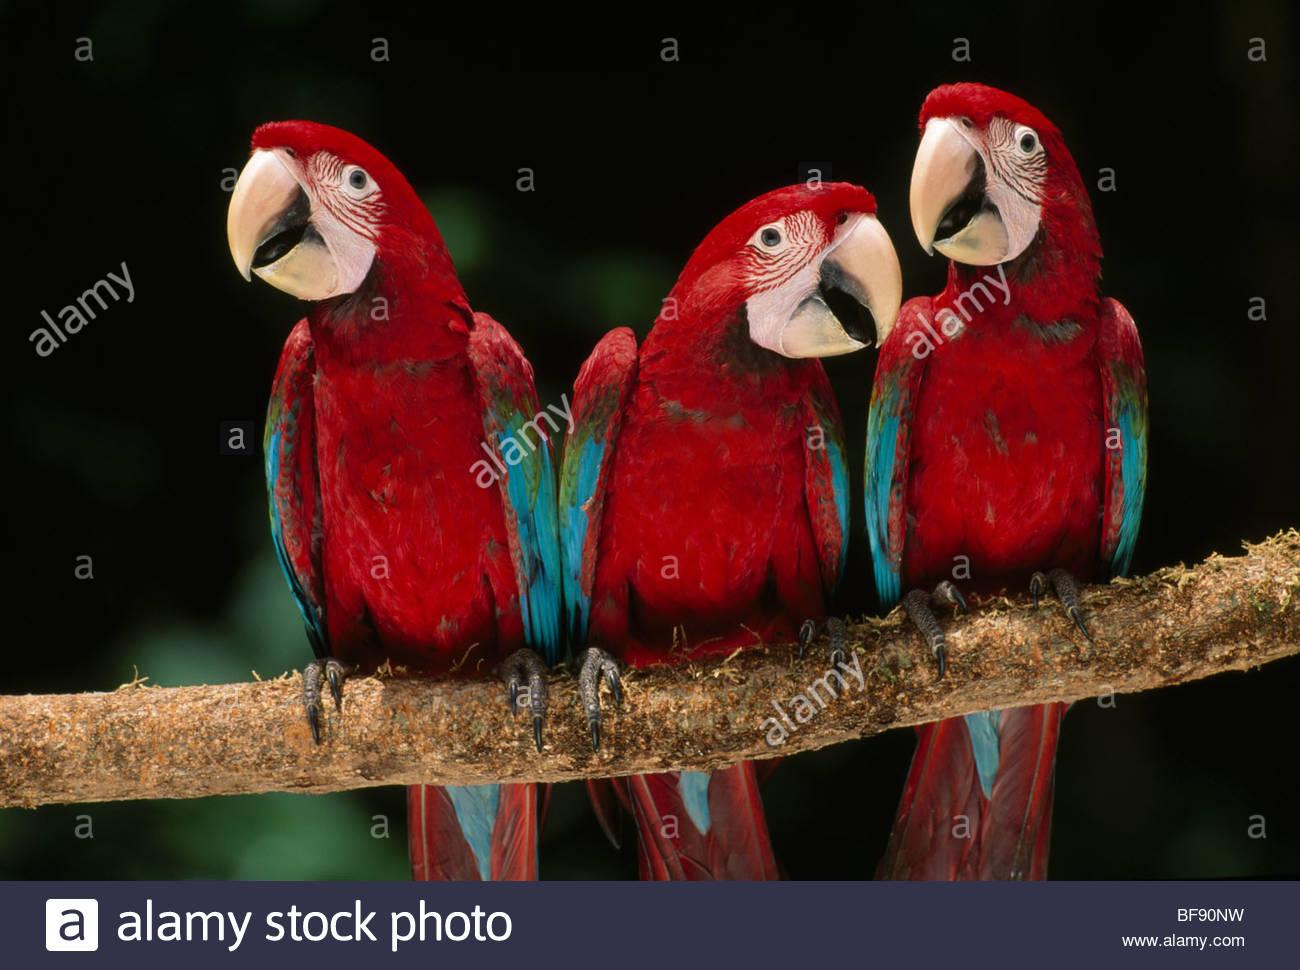 Red-and-green macaw juveniles, Ara chloroptera, Manu National Park, Peru - Stock Image